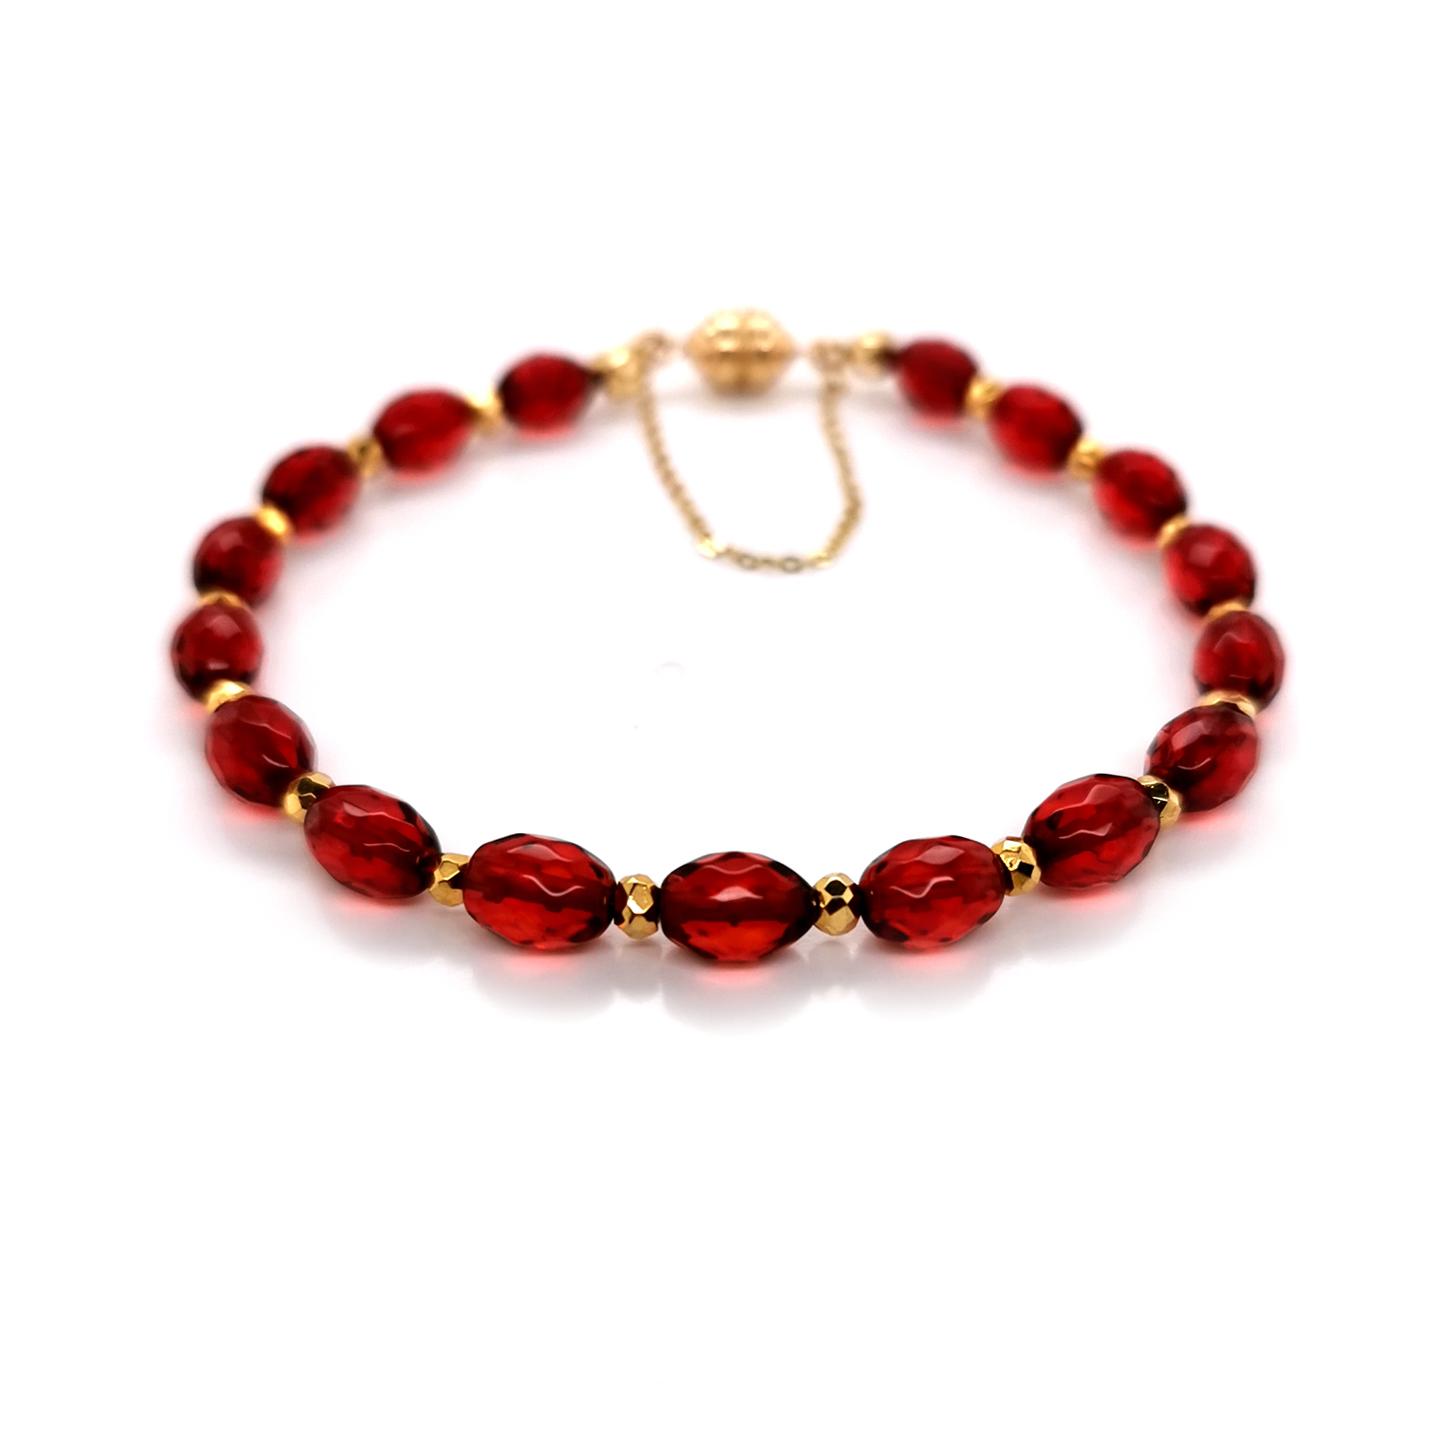 Armband mit rotem Bernstein / Copal & goldcoated Pyrit, Magnetschließe Carat 3000, 375 Gelbgold